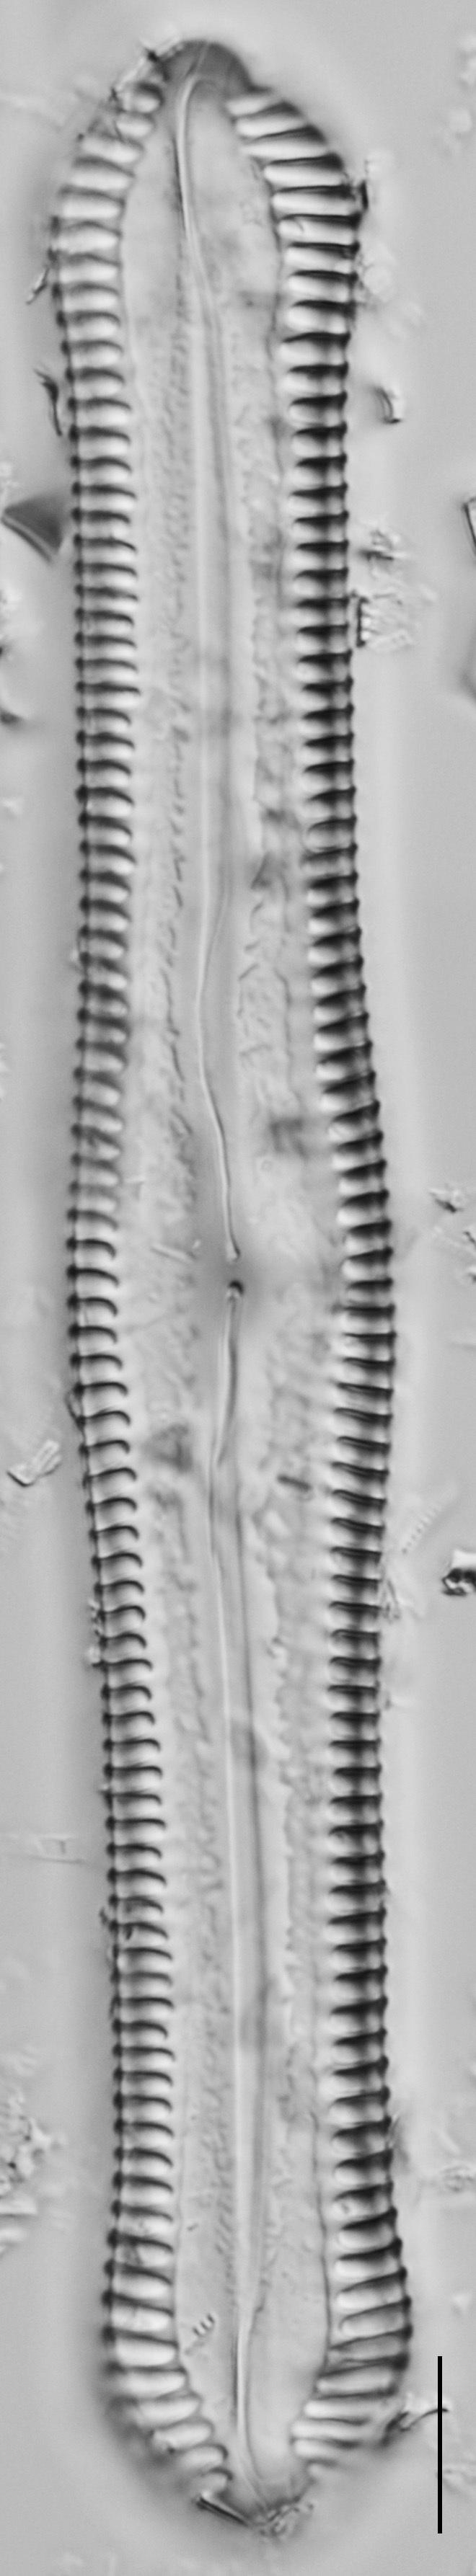 Pinnularia cuneicephala LM6